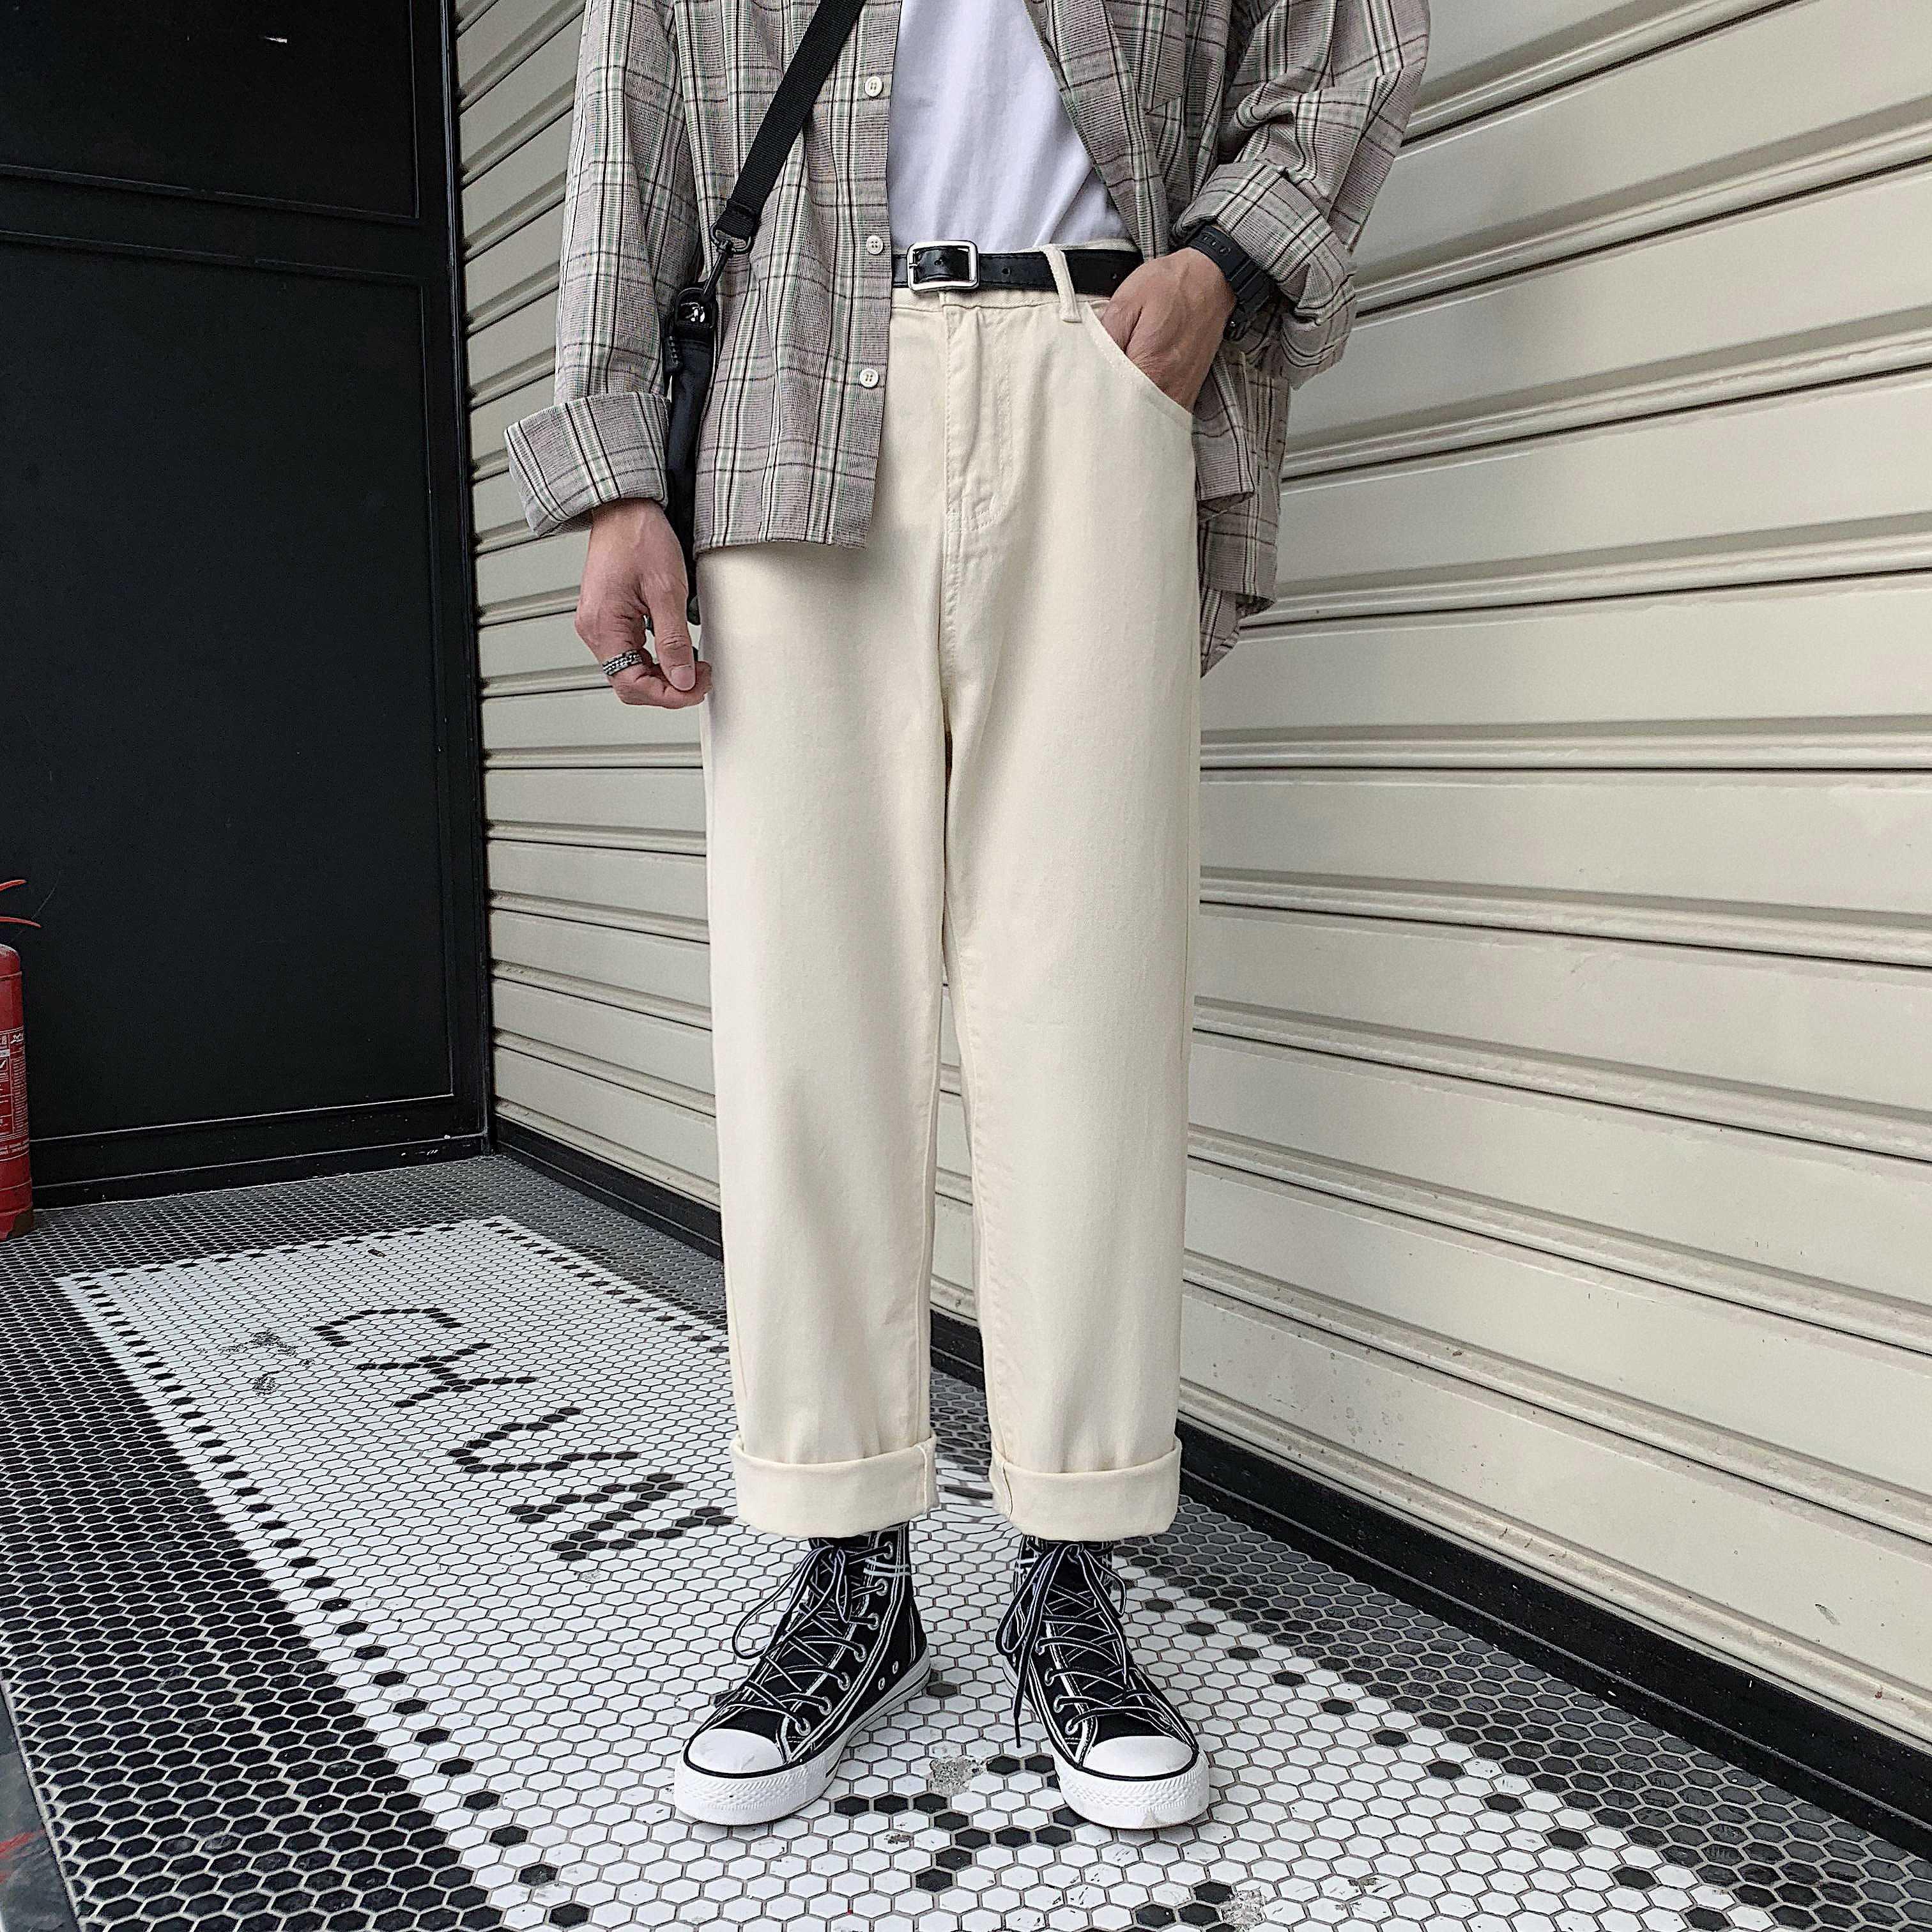 Japanese pants Mens clothing Oversized pants Mens pants Mens tailored pants Mens loose pants Mens black pants Mens patterned pants